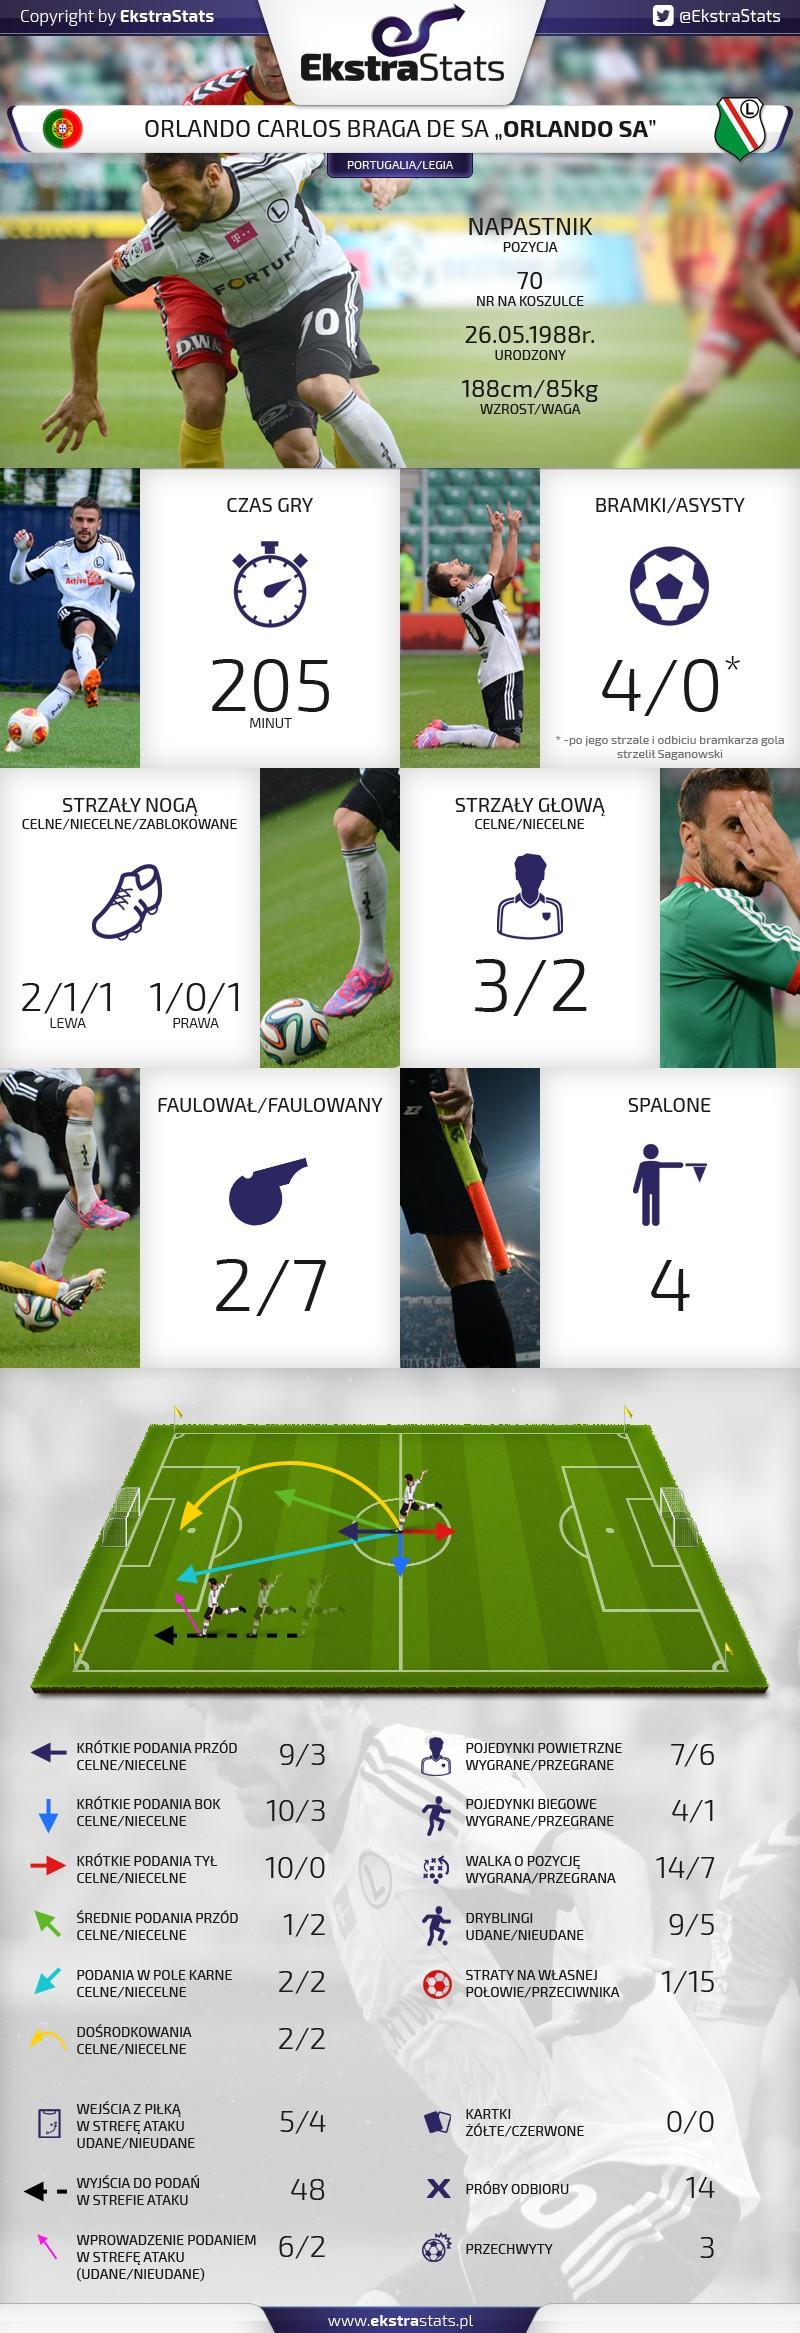 Statystyki Orlando Sa po 7. kolejce sezonu 2014/2015